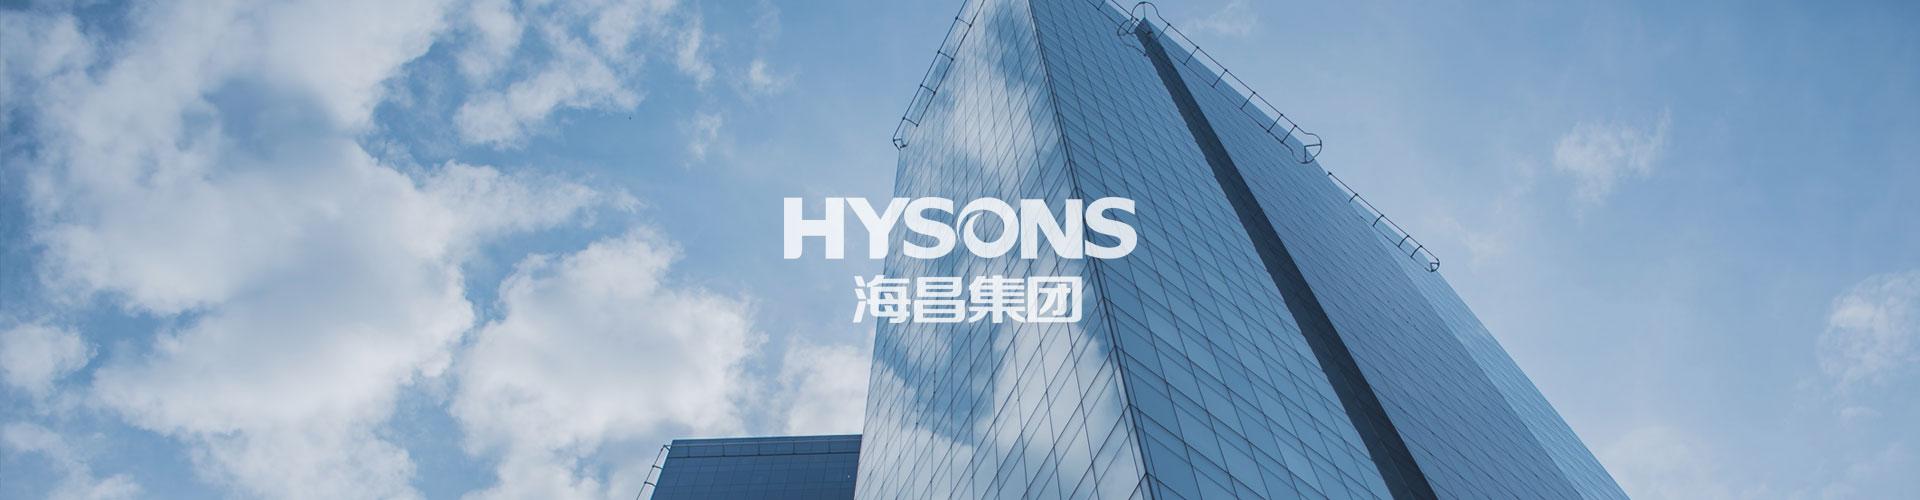 HYSONS-0-1920-500